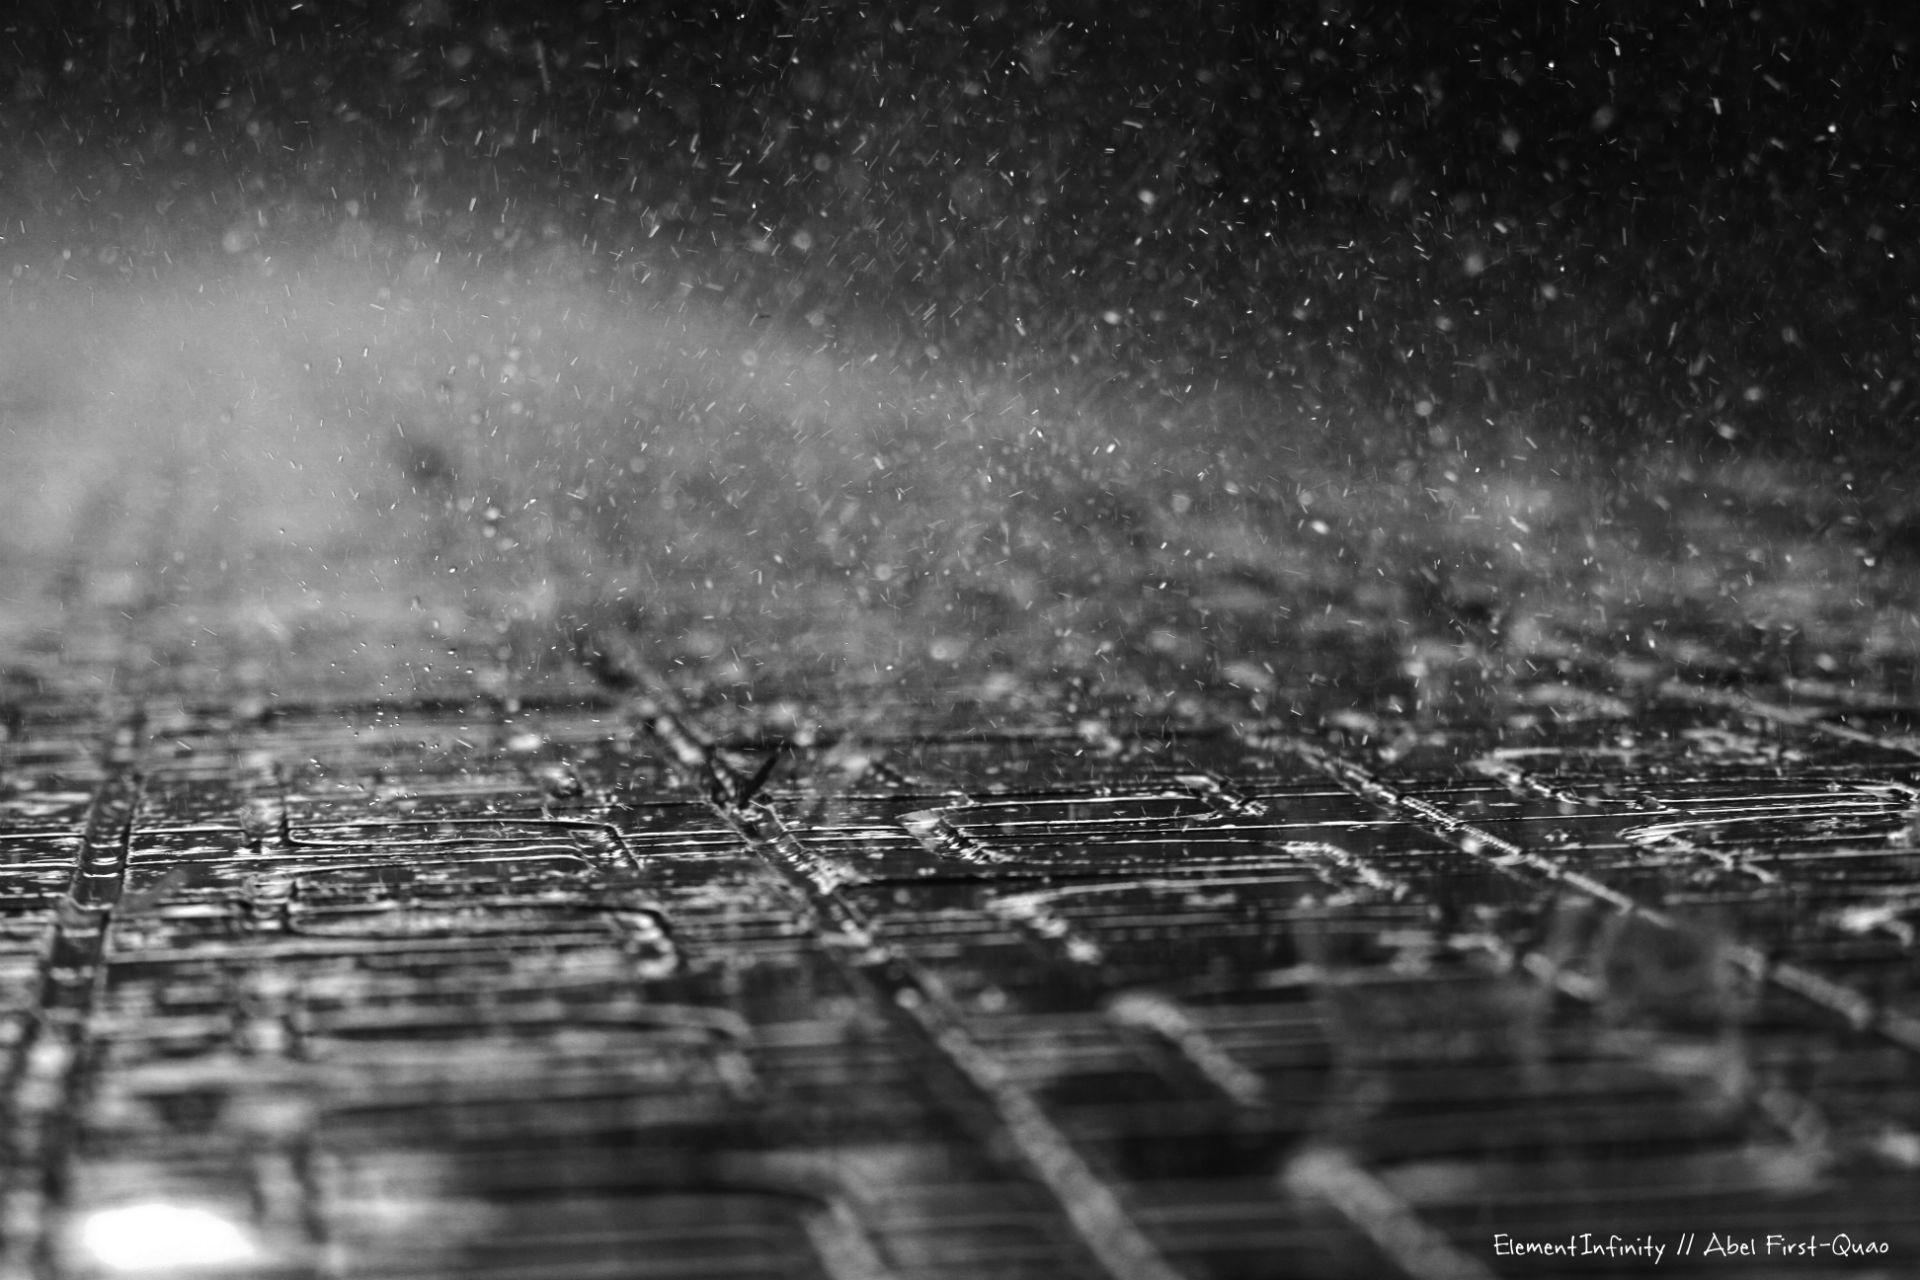 Sidewalk cobble rain storm wet mood wallpaper | | 34847 |  WallpaperUP